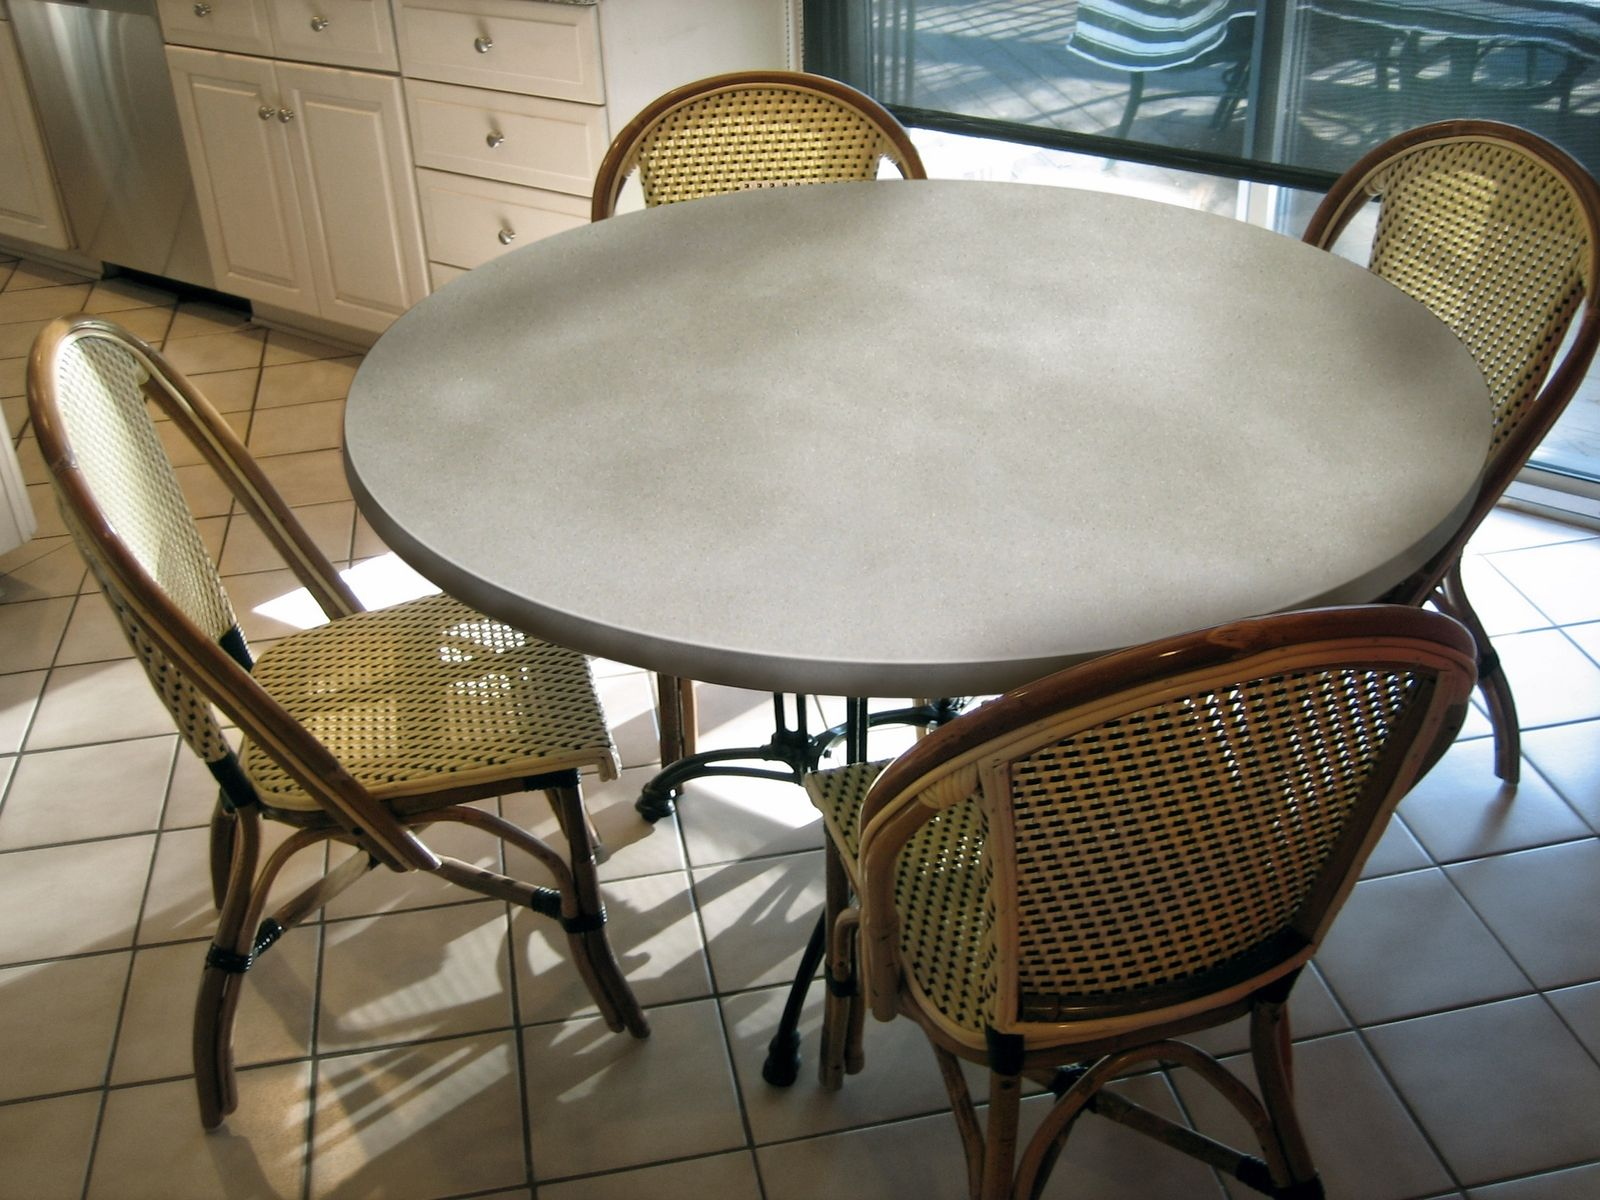 custom made round concrete table tops by trueform concrete. Black Bedroom Furniture Sets. Home Design Ideas